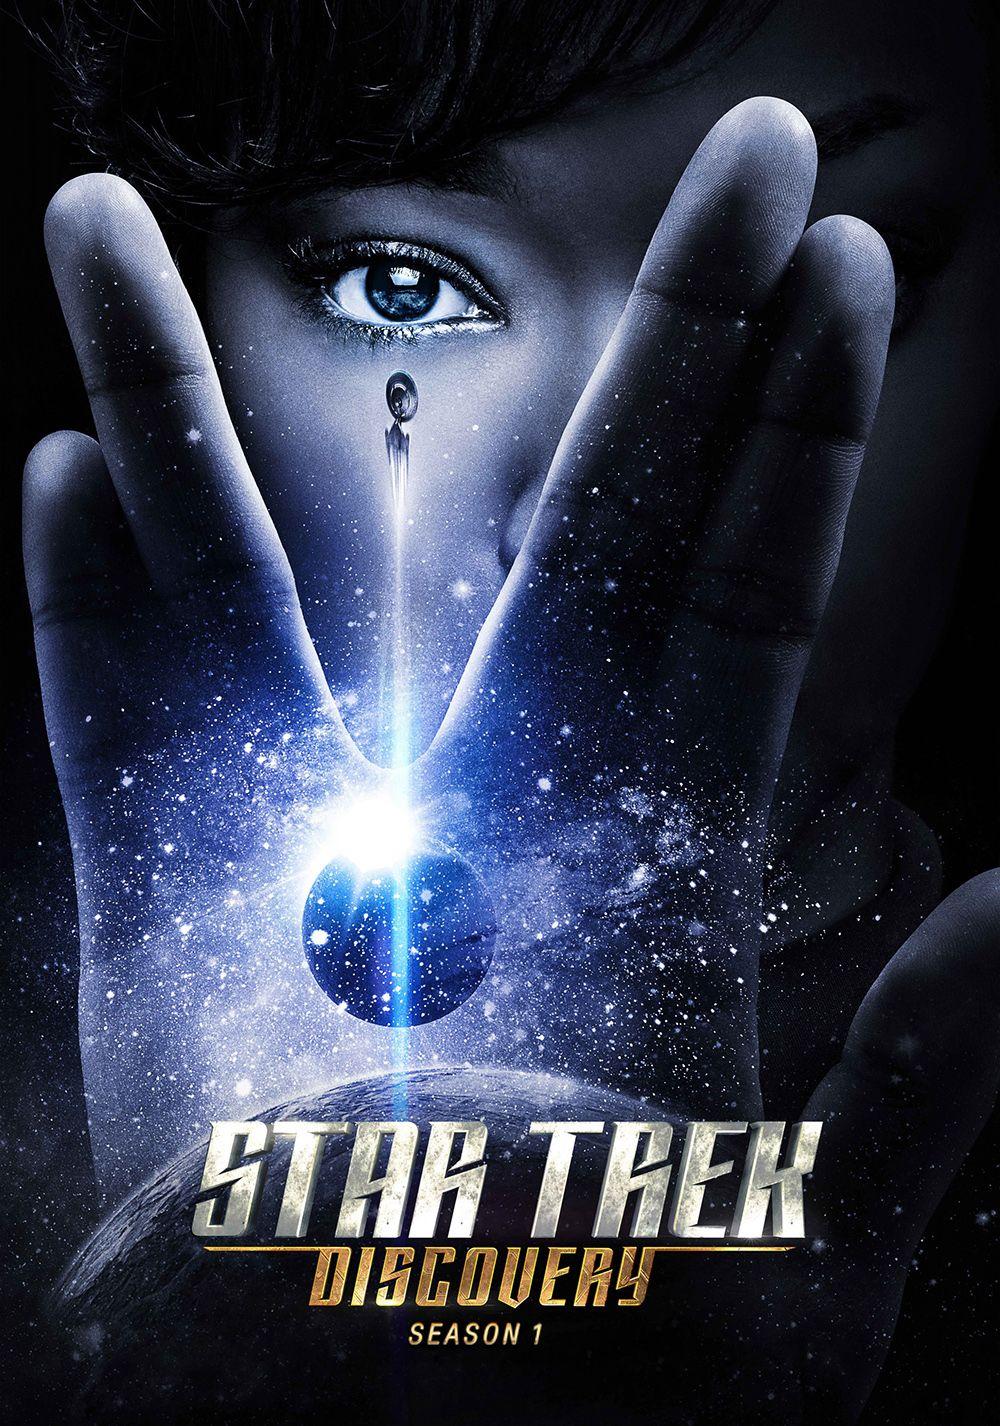 Star Trek Discovery S03 indir 1080p [EN-TRSUB] Torrent indir